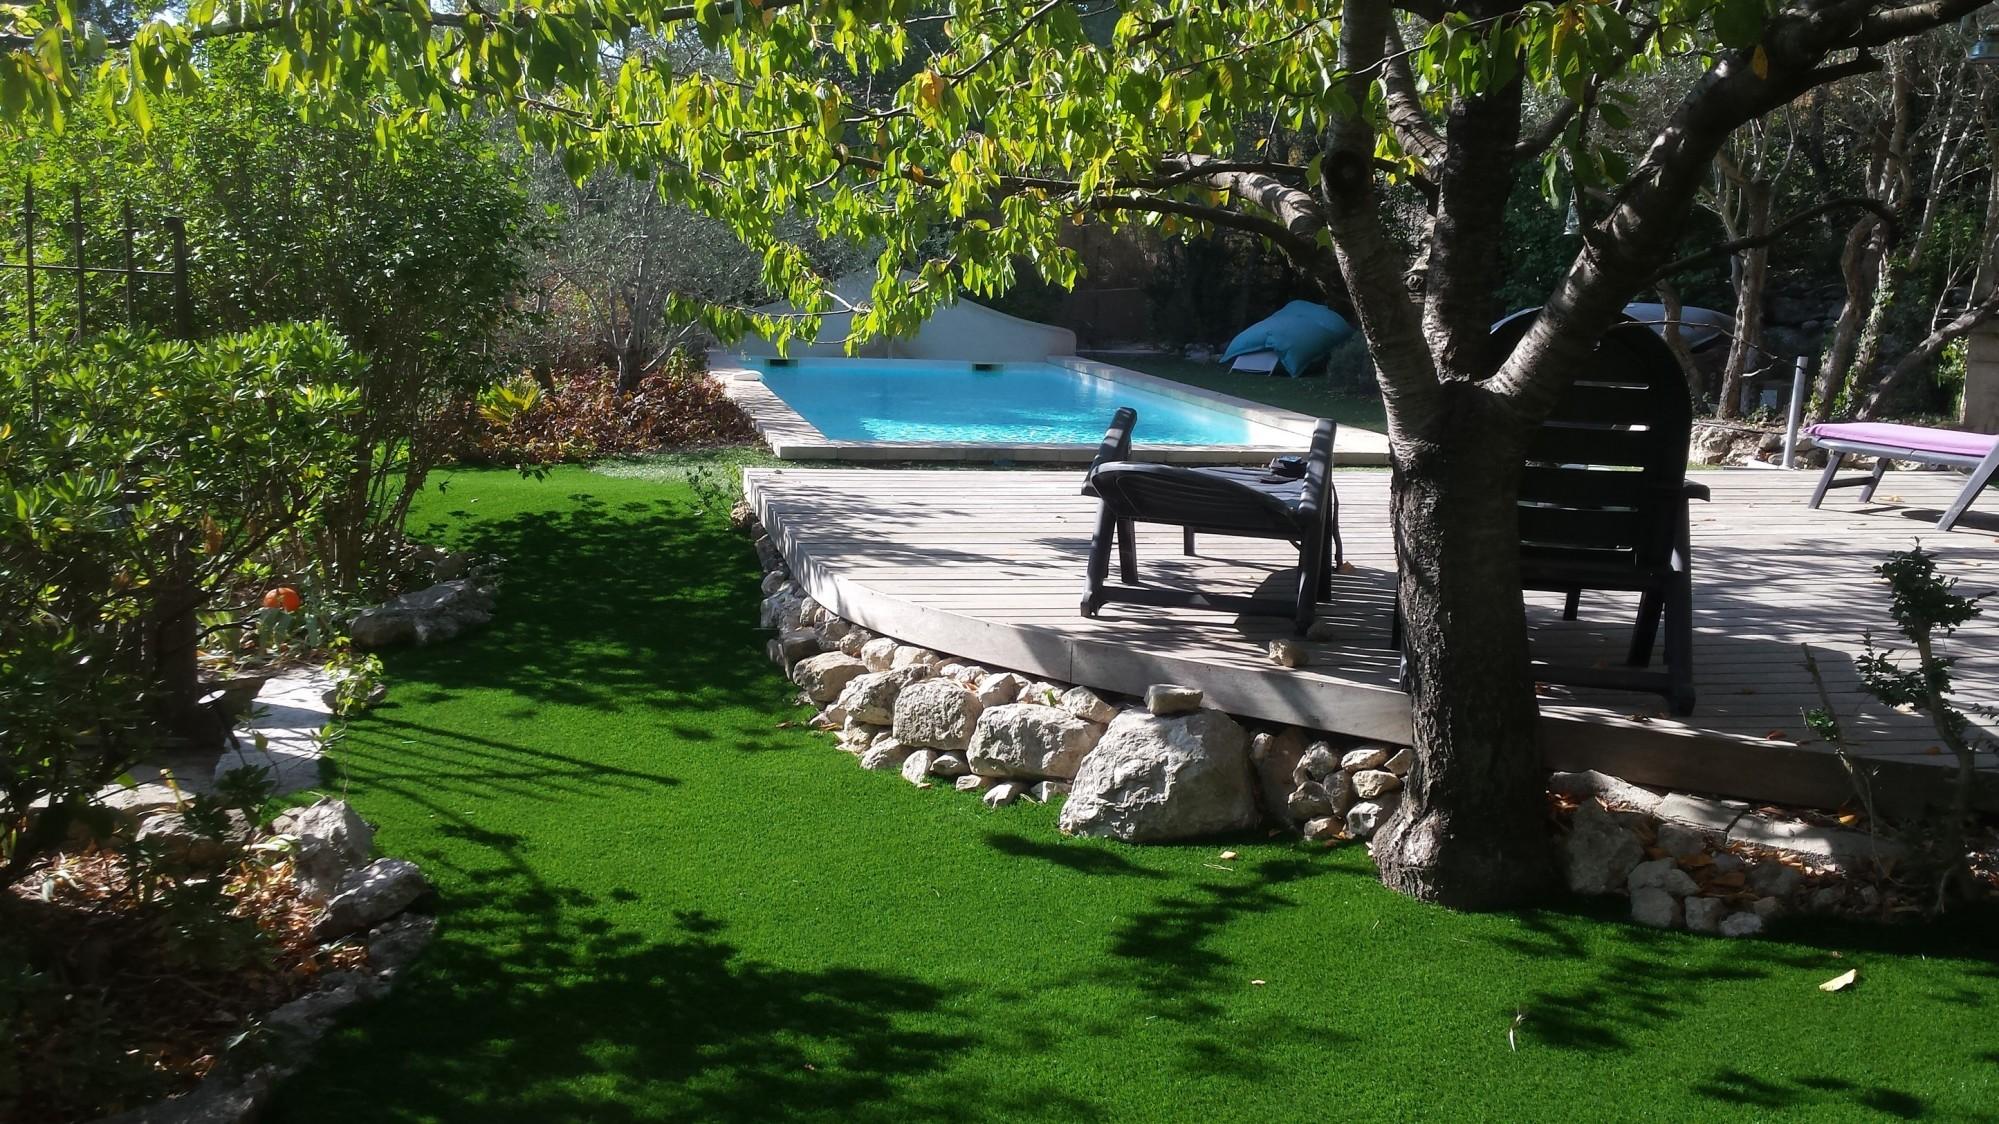 gazon synth tique greasque bouches du rh ne 13 la pose gazon synth tique gazon et pelouse. Black Bedroom Furniture Sets. Home Design Ideas